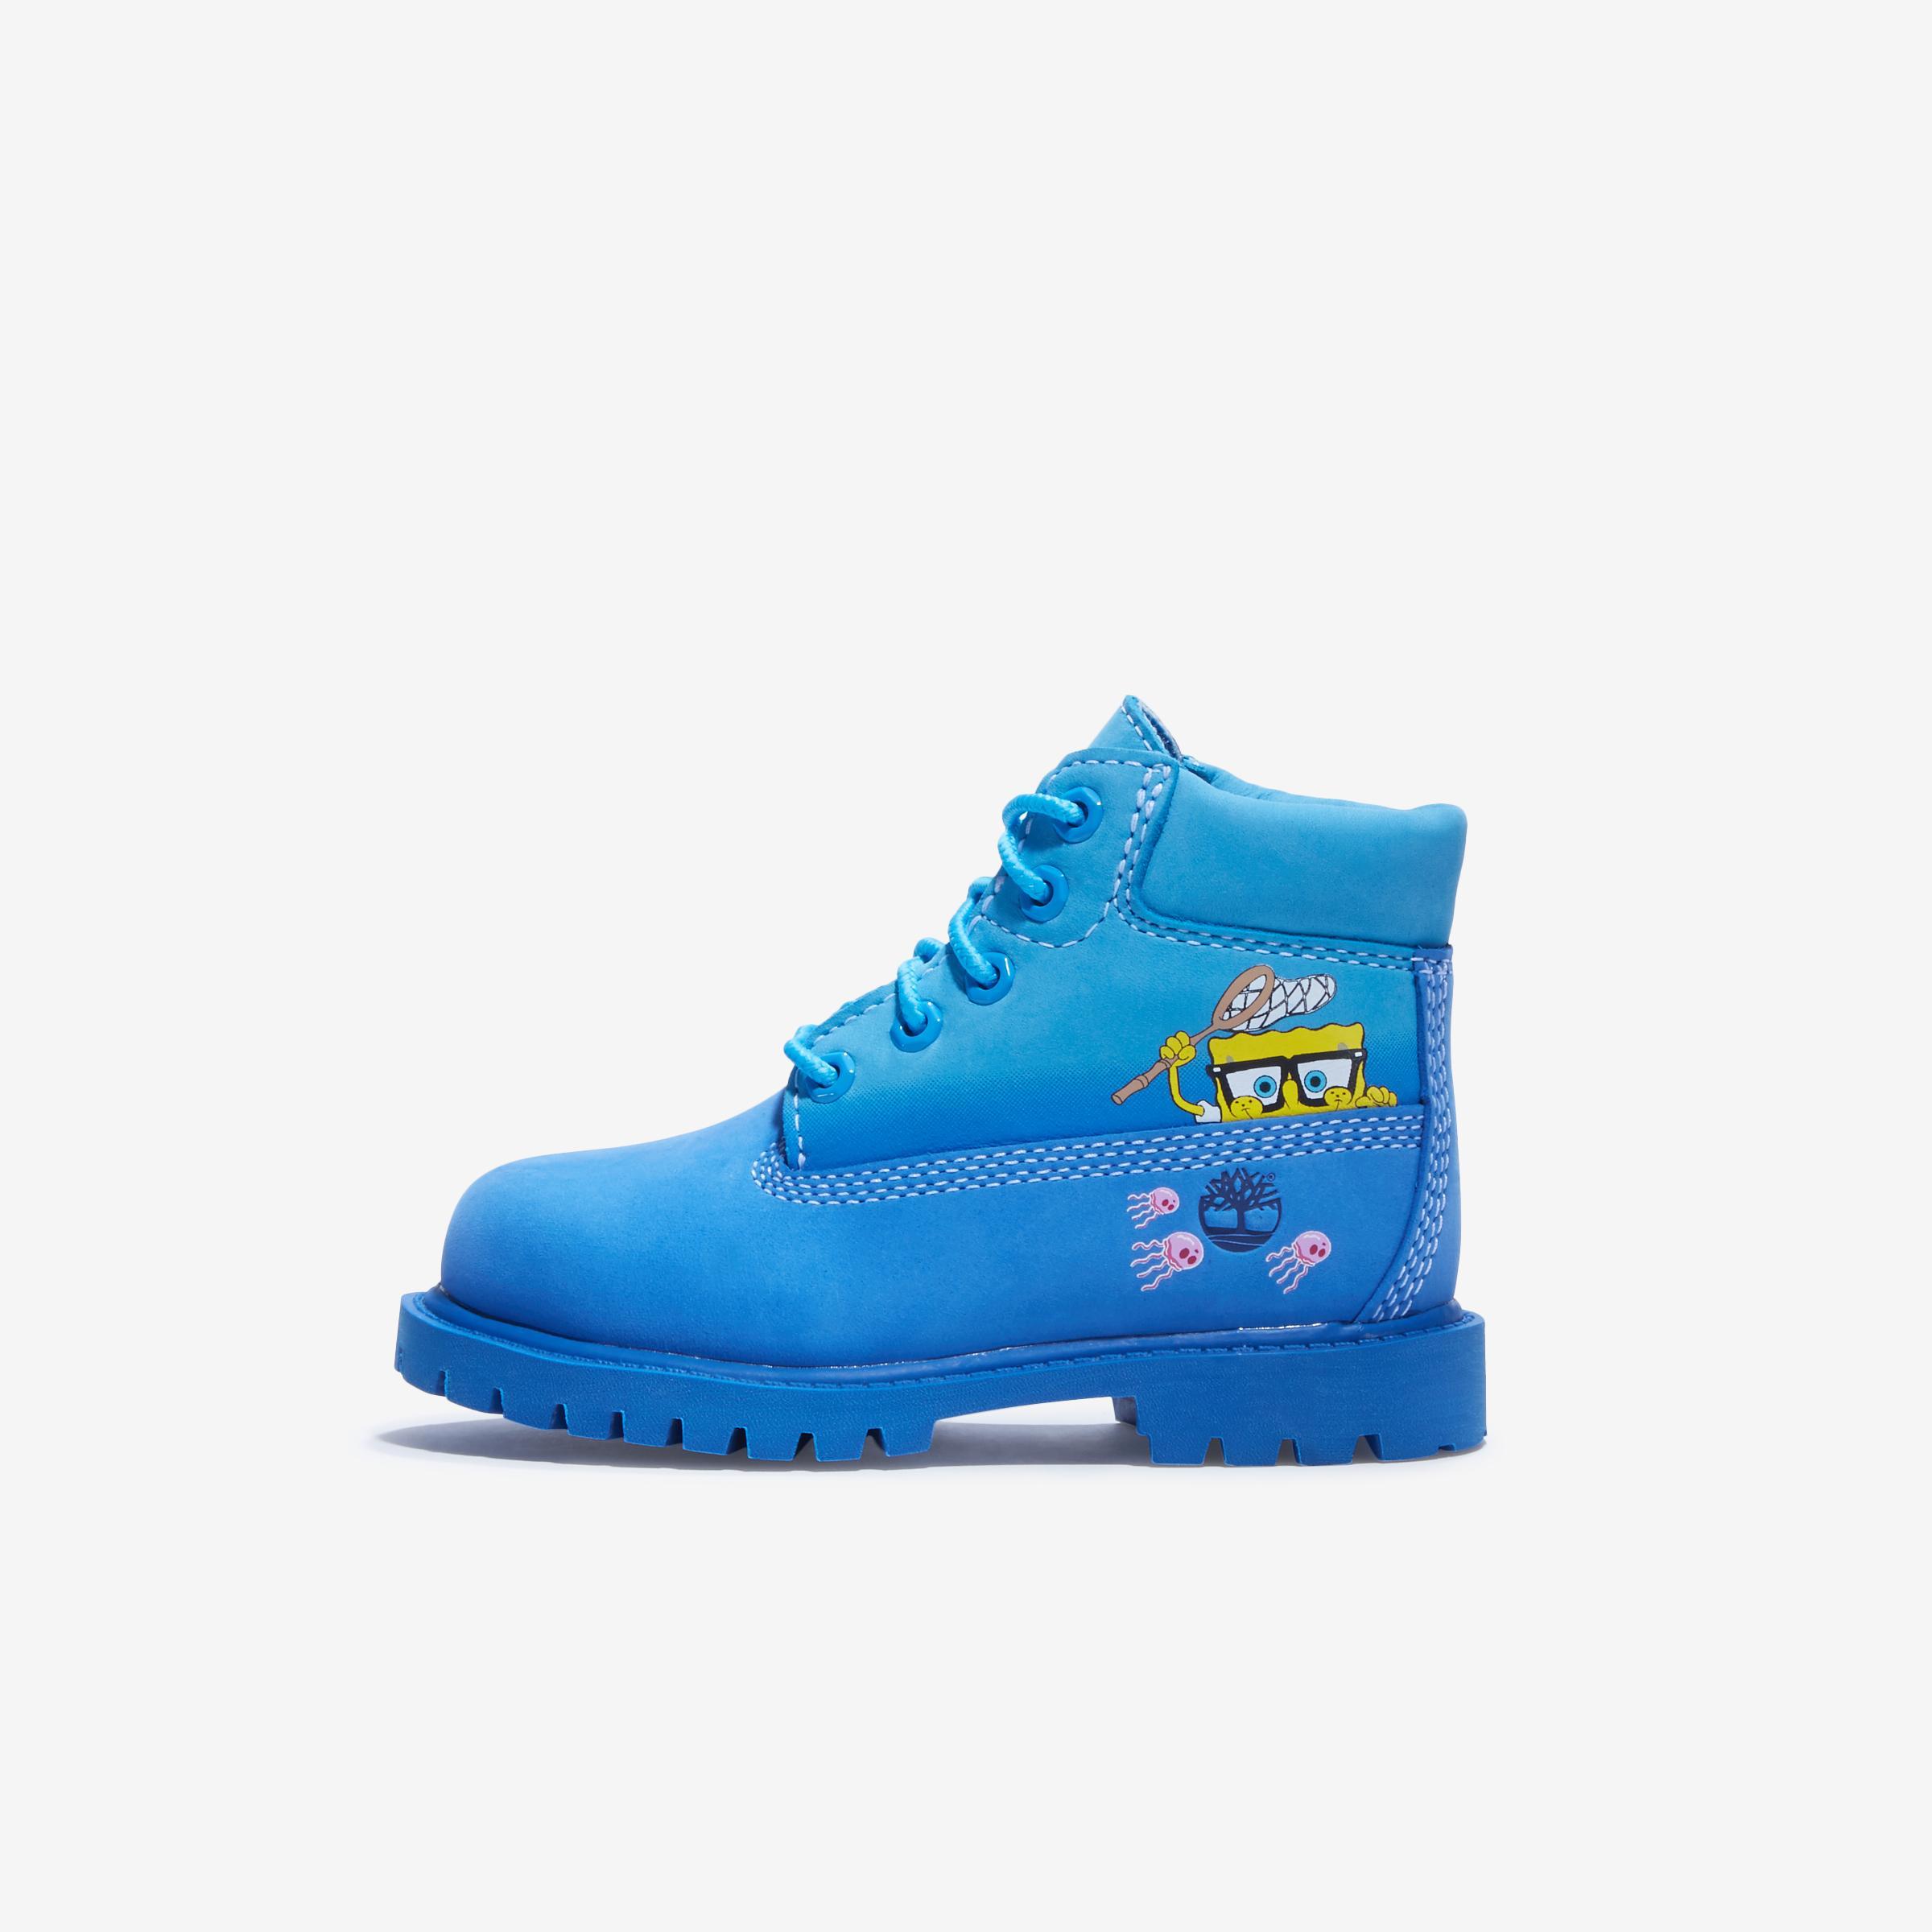 Toddler Spongebob X Timberland 6- Inch Waterproof Boots